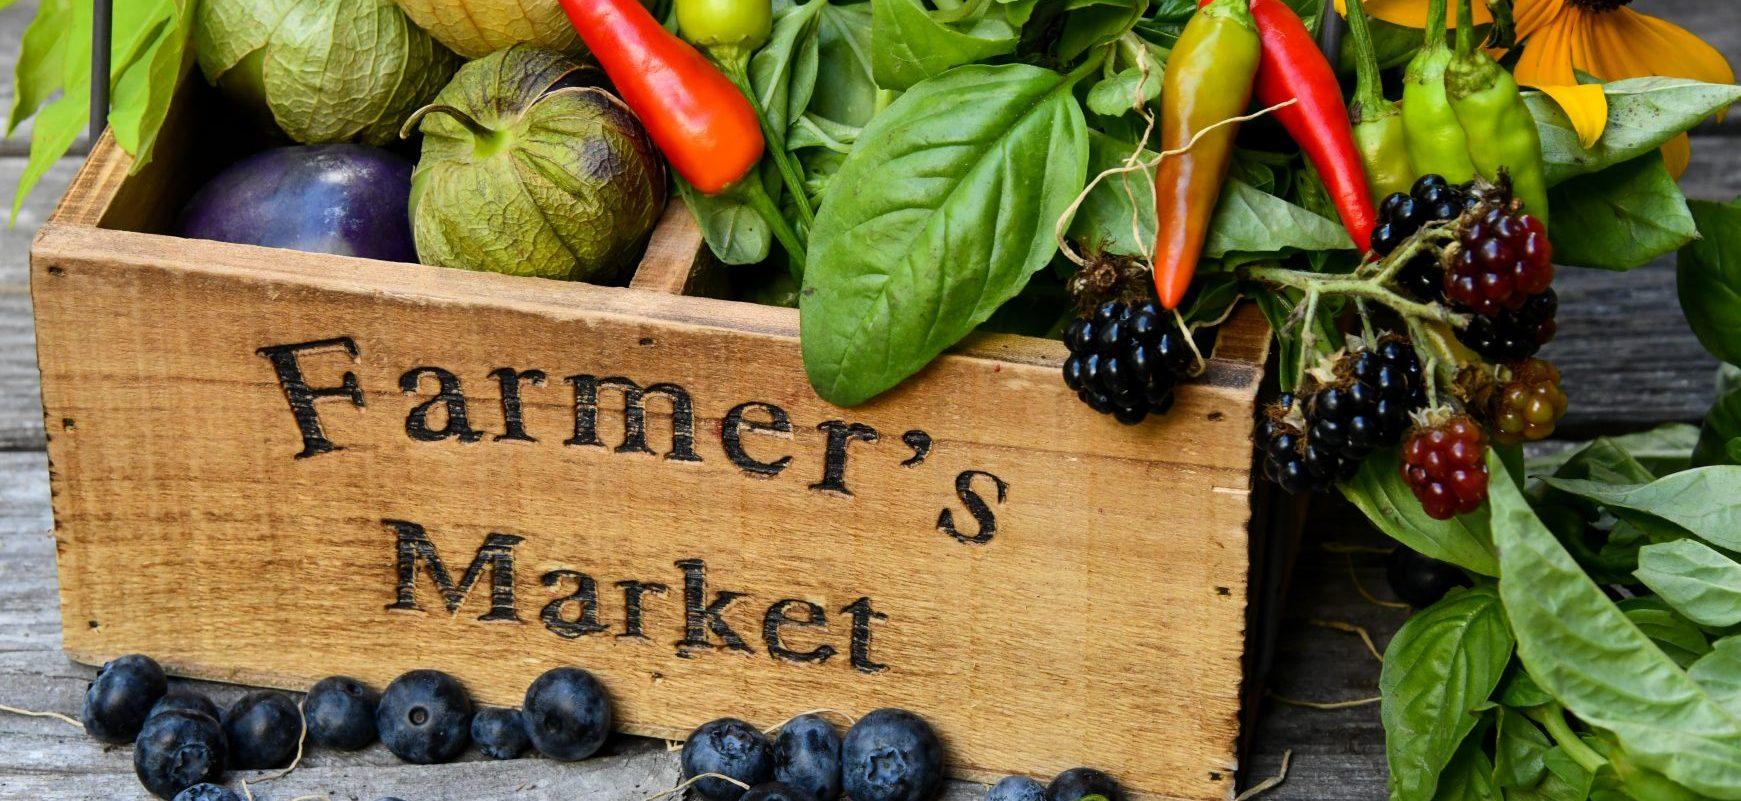 Farmers market aspect ratio 100 46